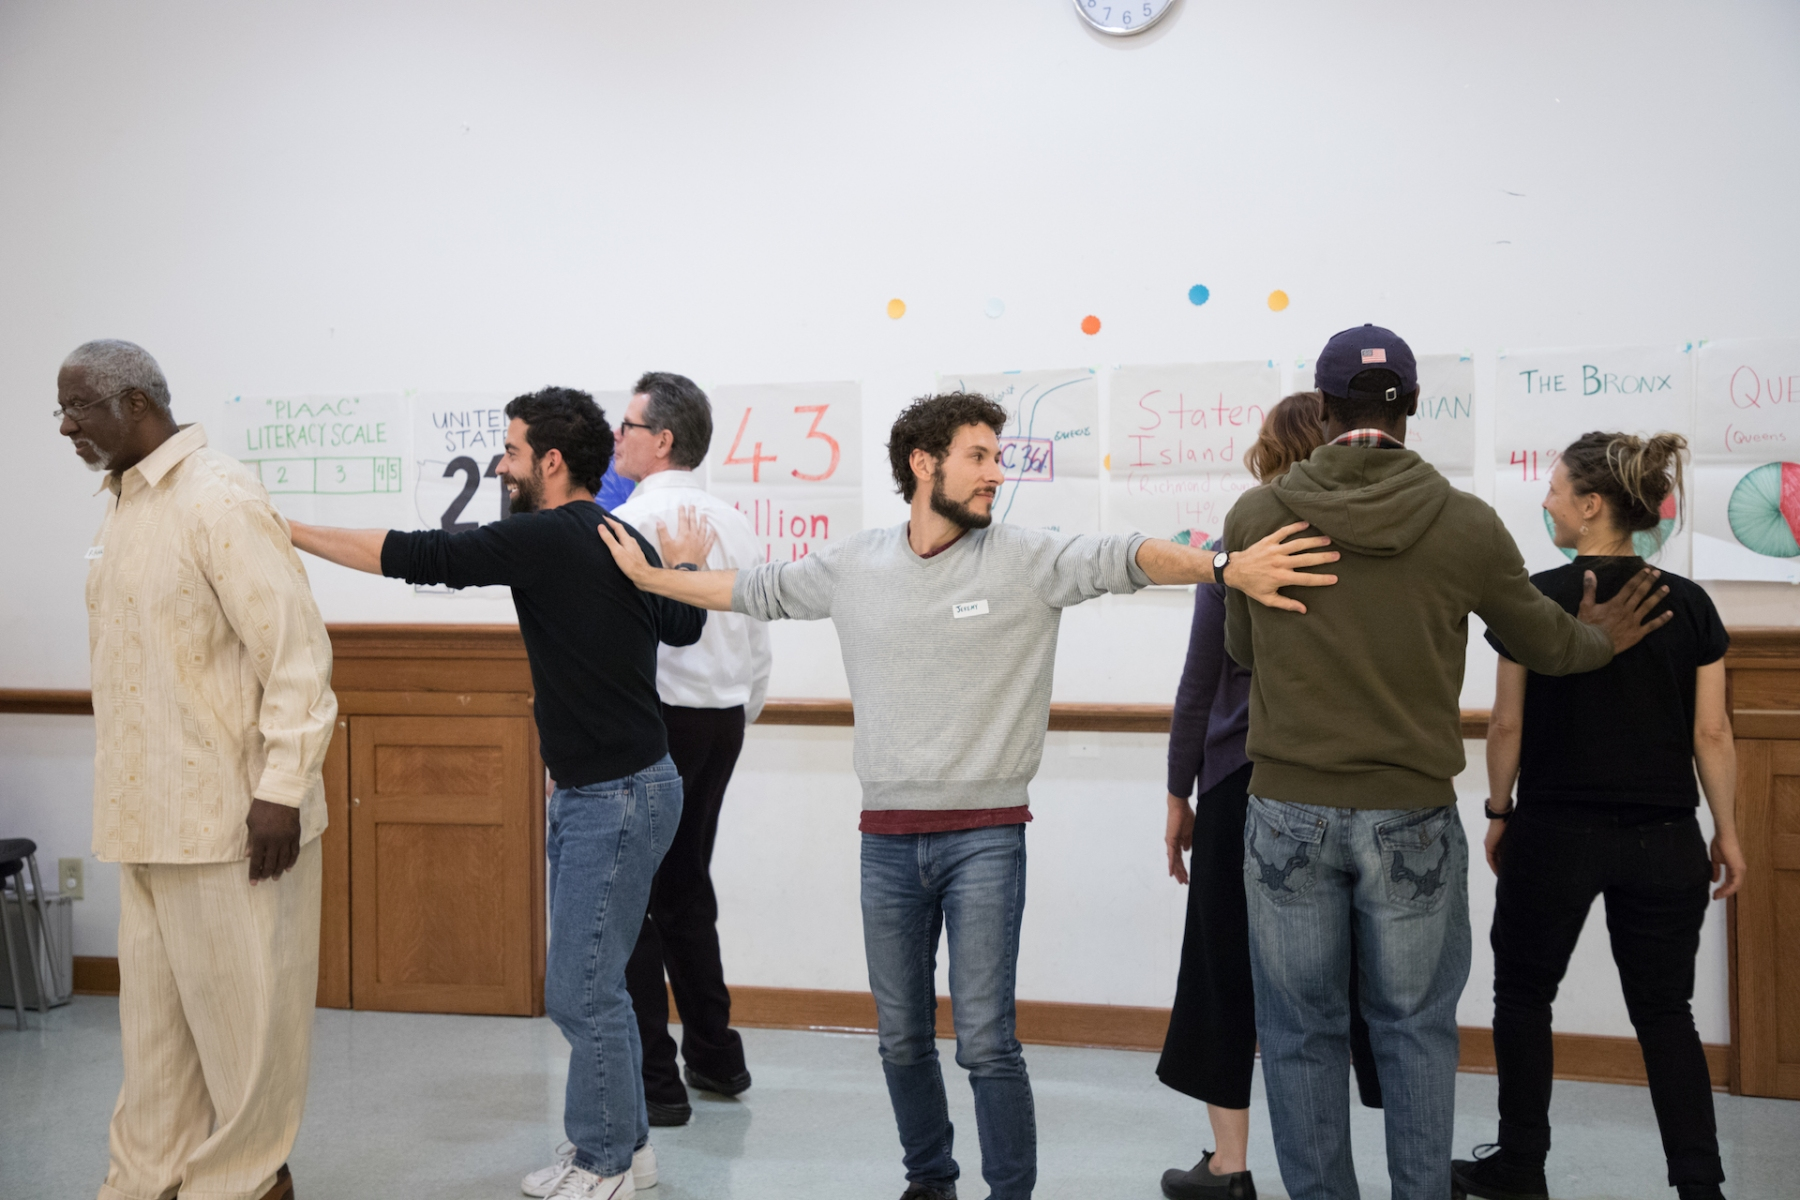 Workshop photo by Ashley East